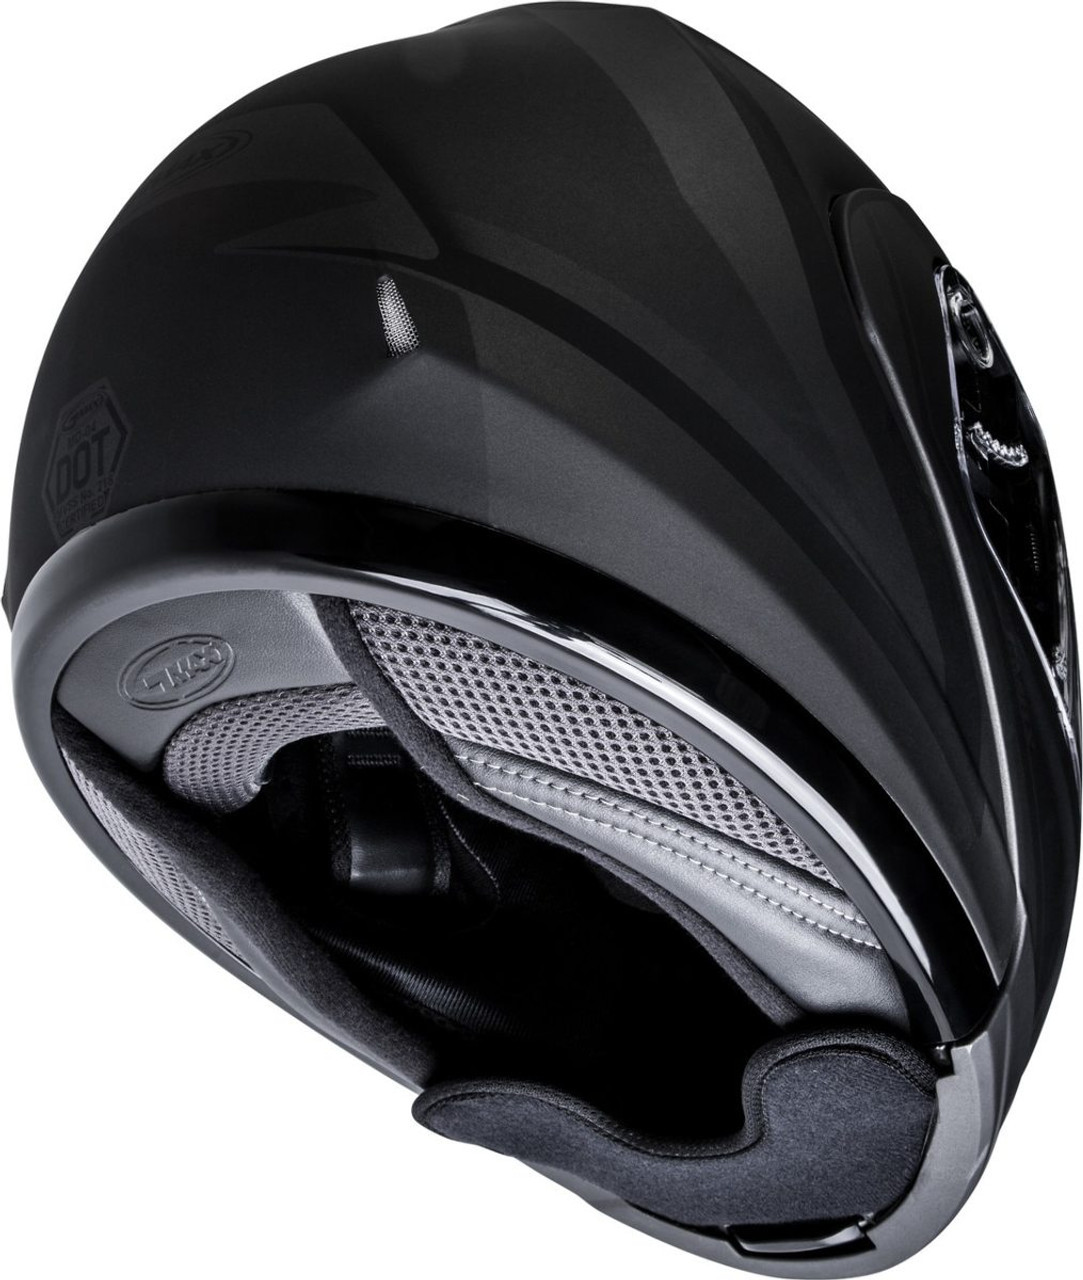 GMAX MD-04S Docket Snow Helmet Matte Dark Silver/Black